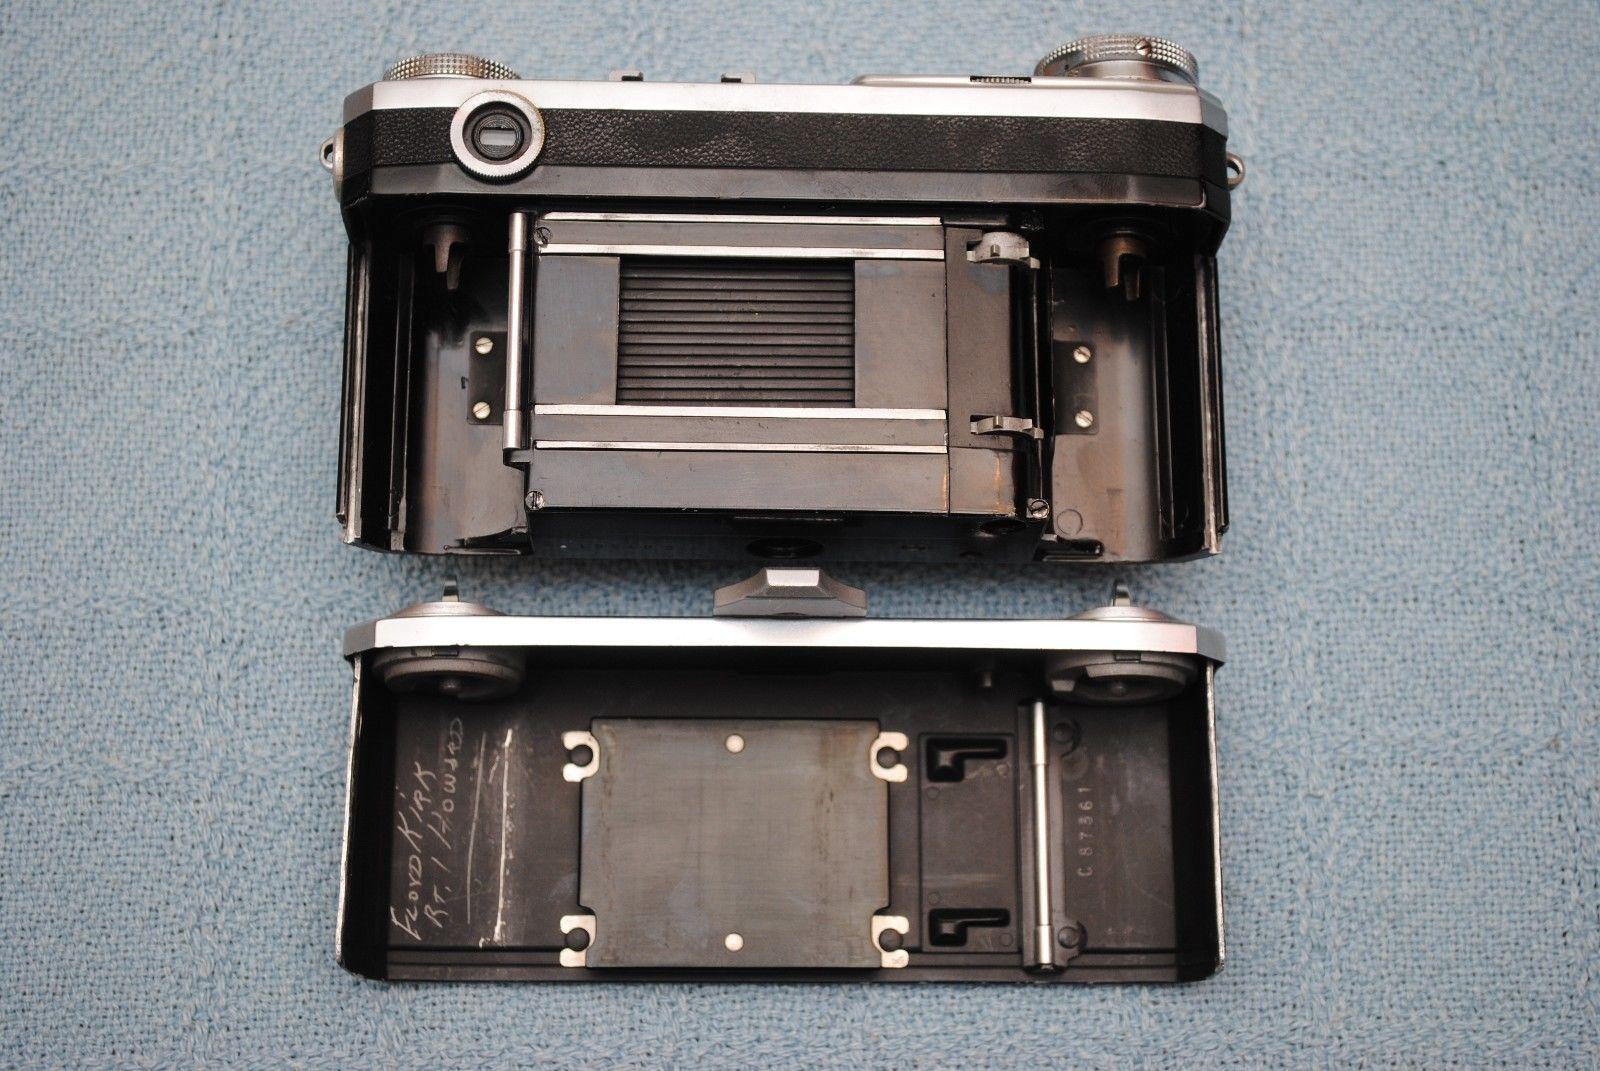 Original 1936 37 Zeiss Ikon Contax II 35mm Camera | eBay